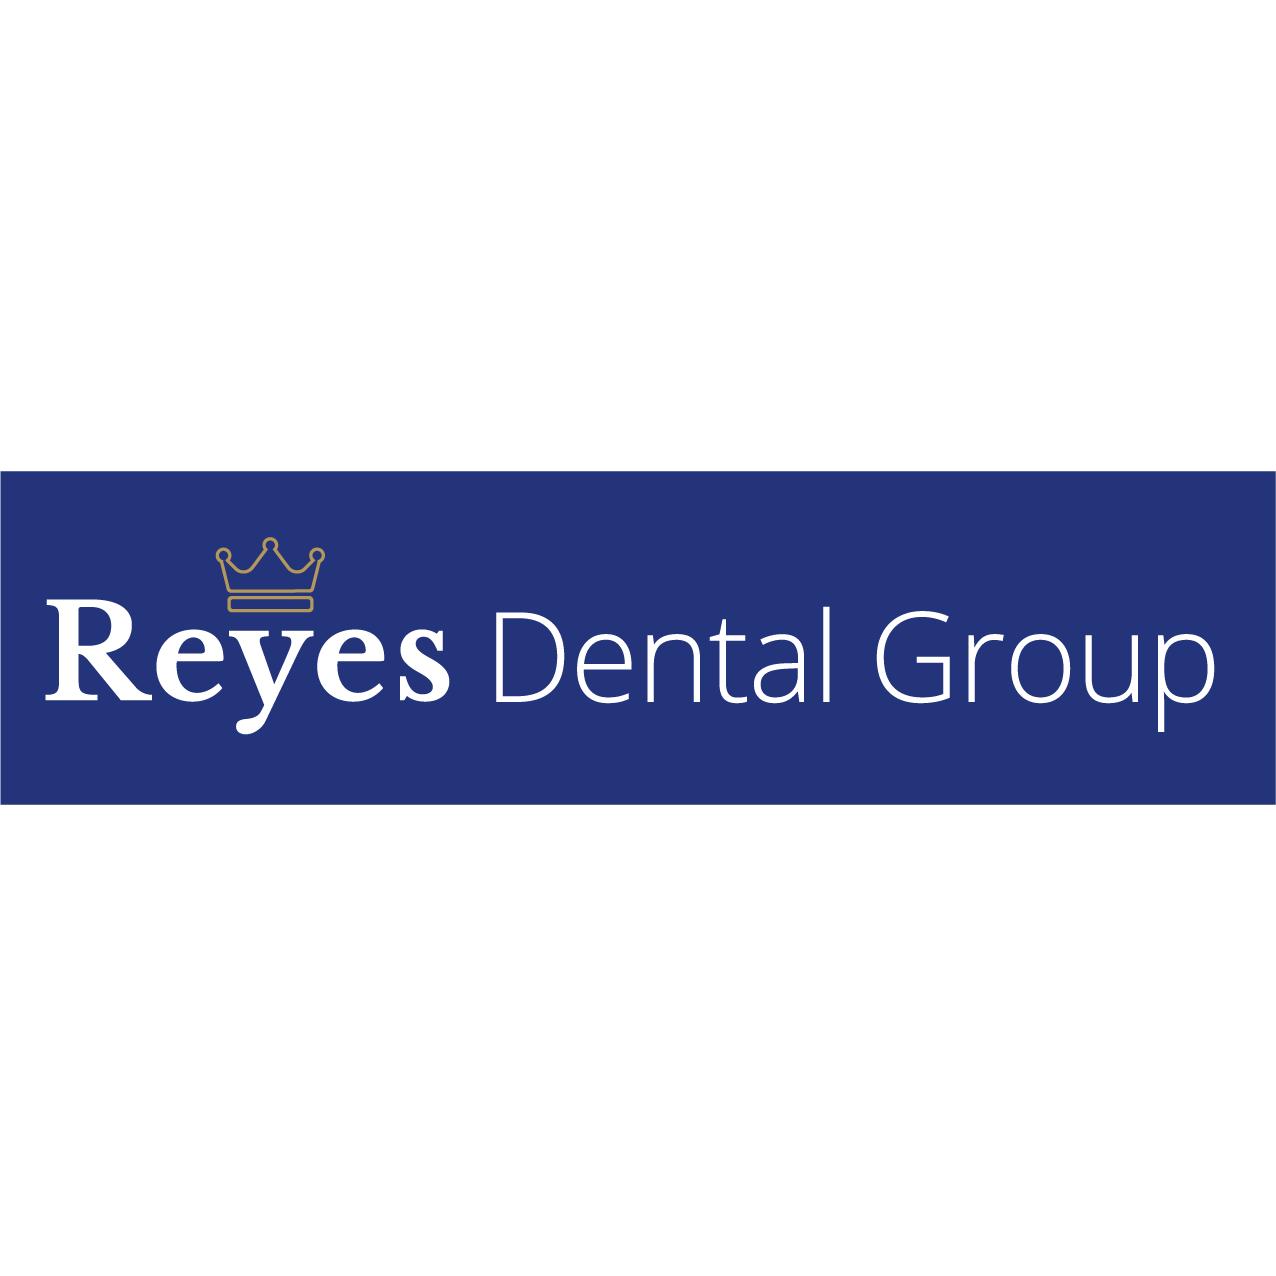 Reyes Dental Group - Lorton, VA 22079 - (703)337-4272 | ShowMeLocal.com